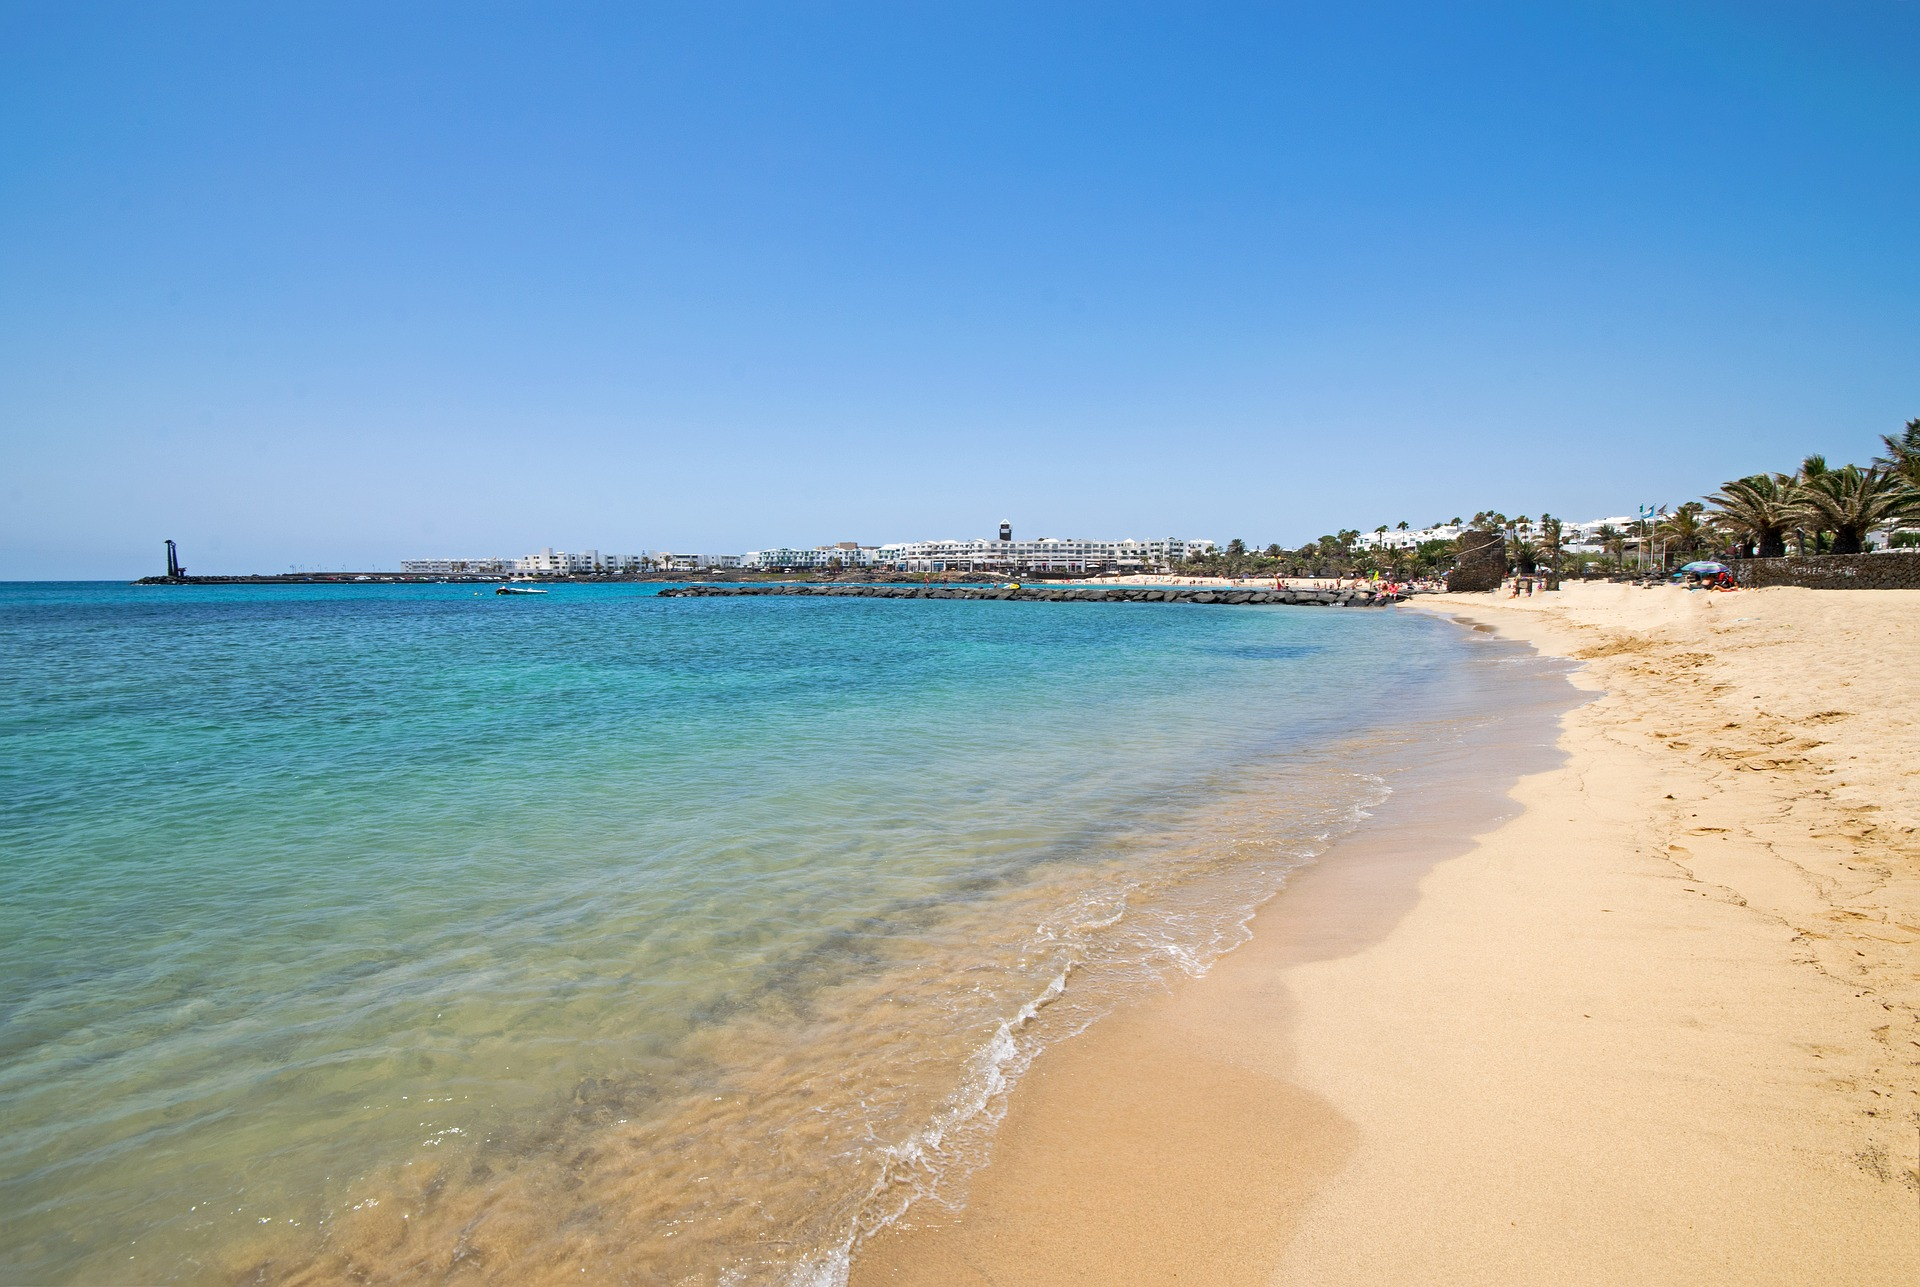 Playa de Las Cucharas - Weitläufiger Sandstrand